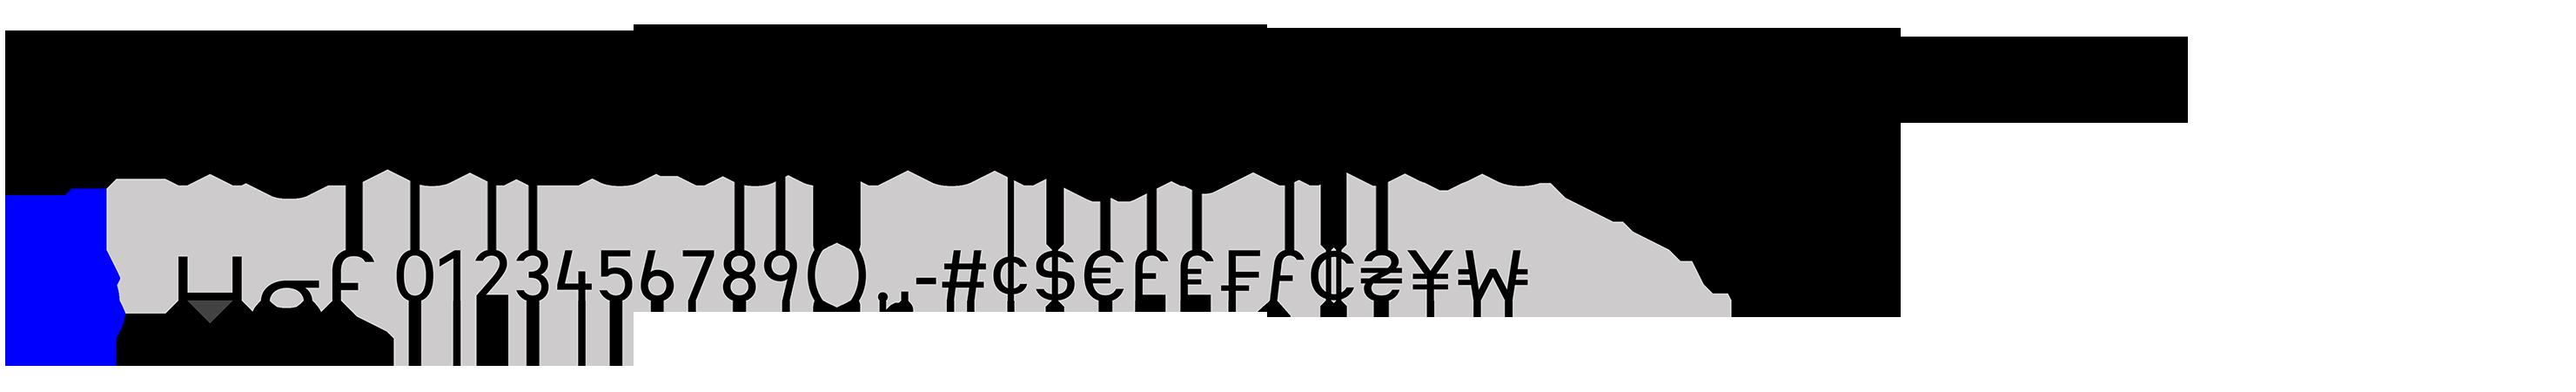 Typeface-Heimat-Sans-F12-Atlas-Font-Foundry